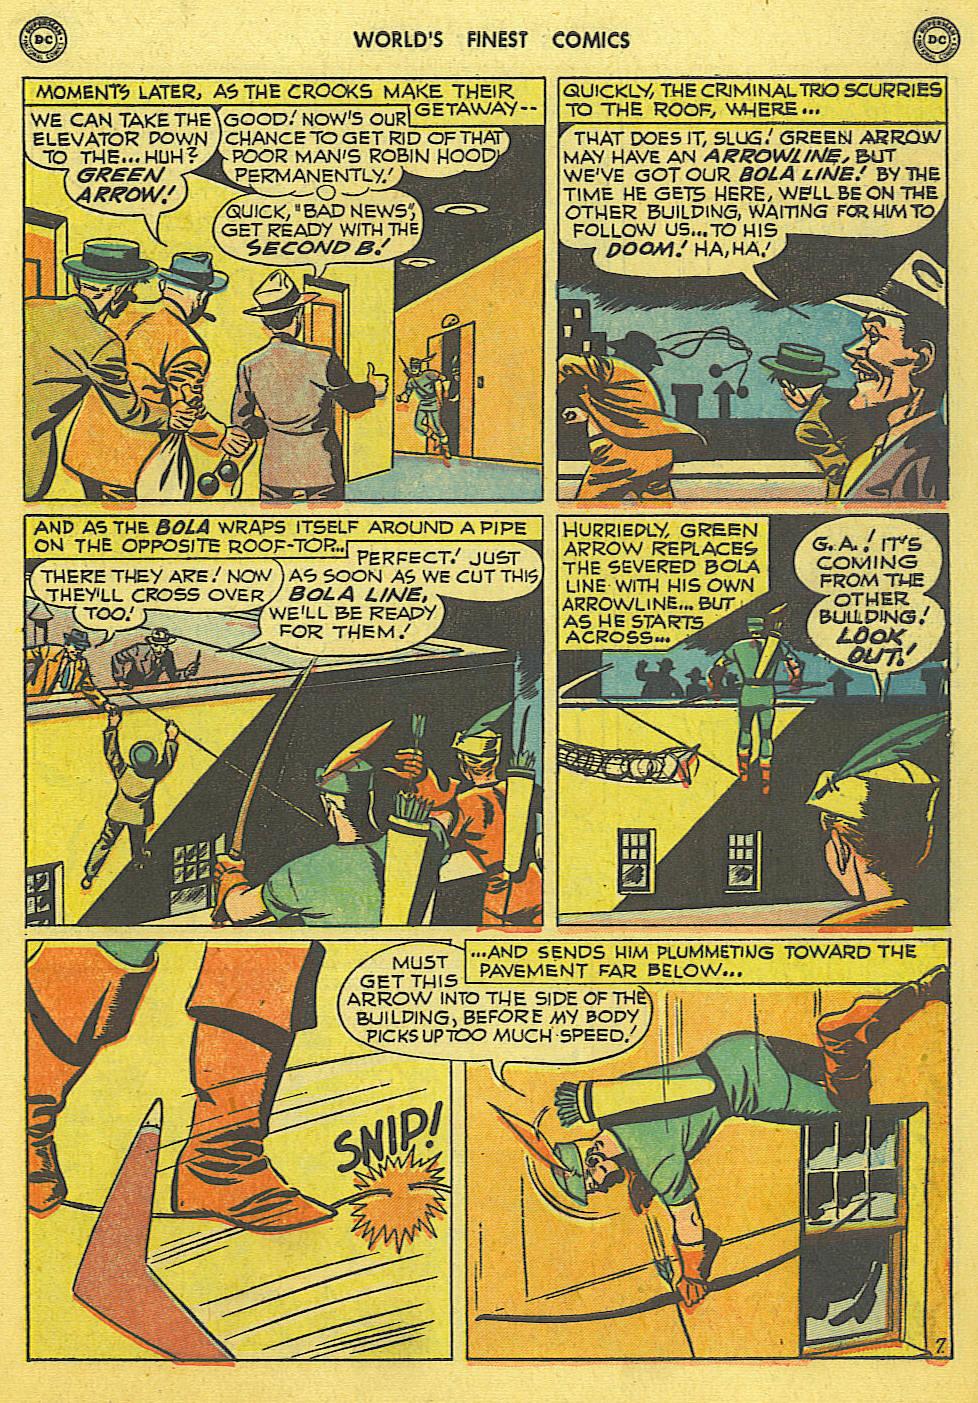 Read online World's Finest Comics comic -  Issue #49 - 24